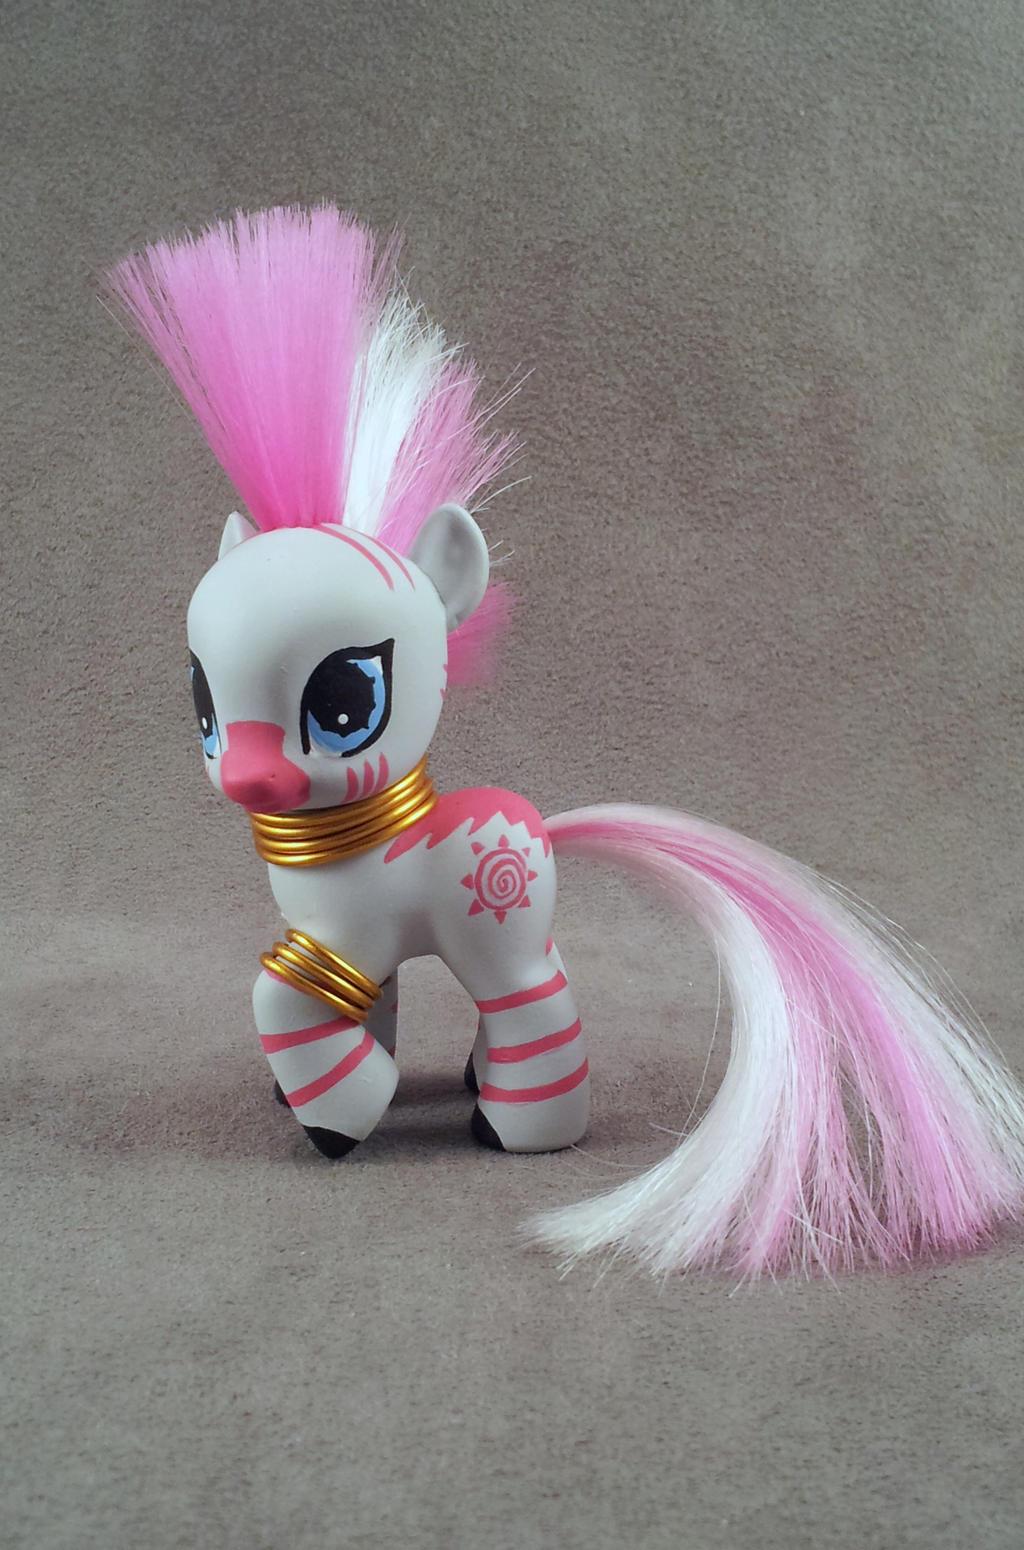 pink_filly_zecora_custom_mlp_fim_by_hann